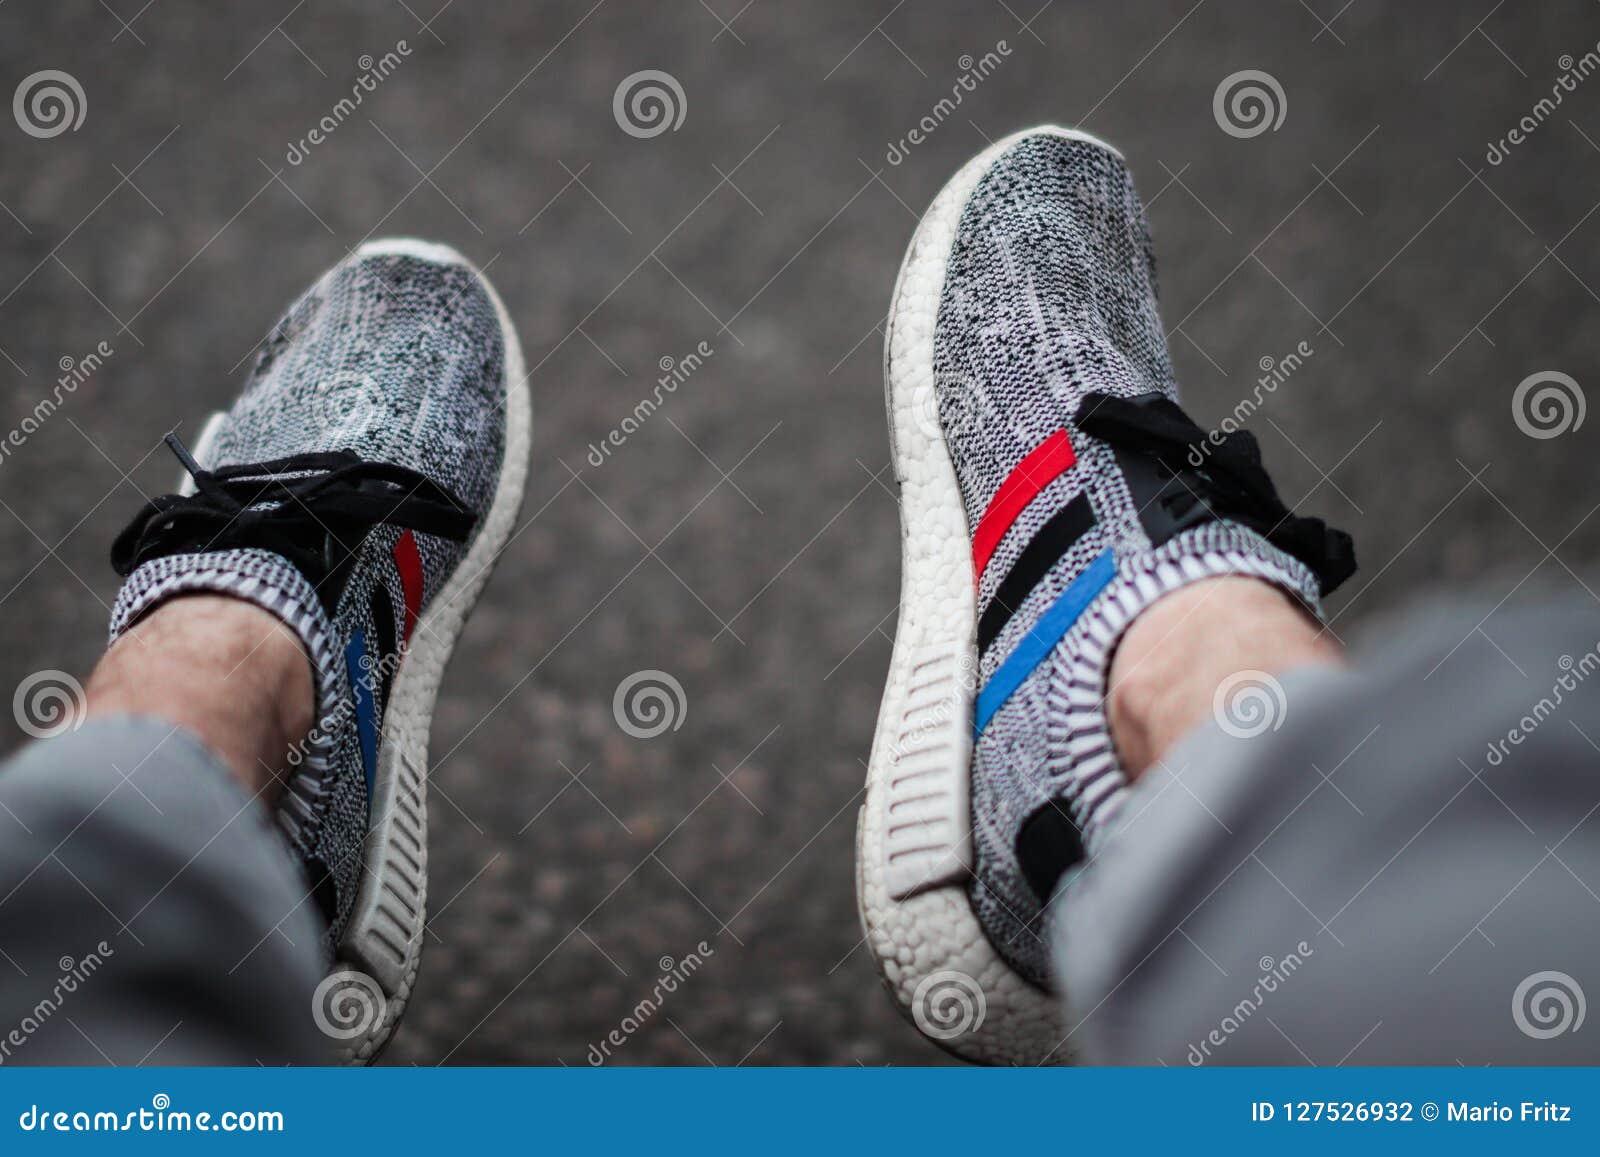 La Marque Adidas Met En évidence Constamment De Nouvelles